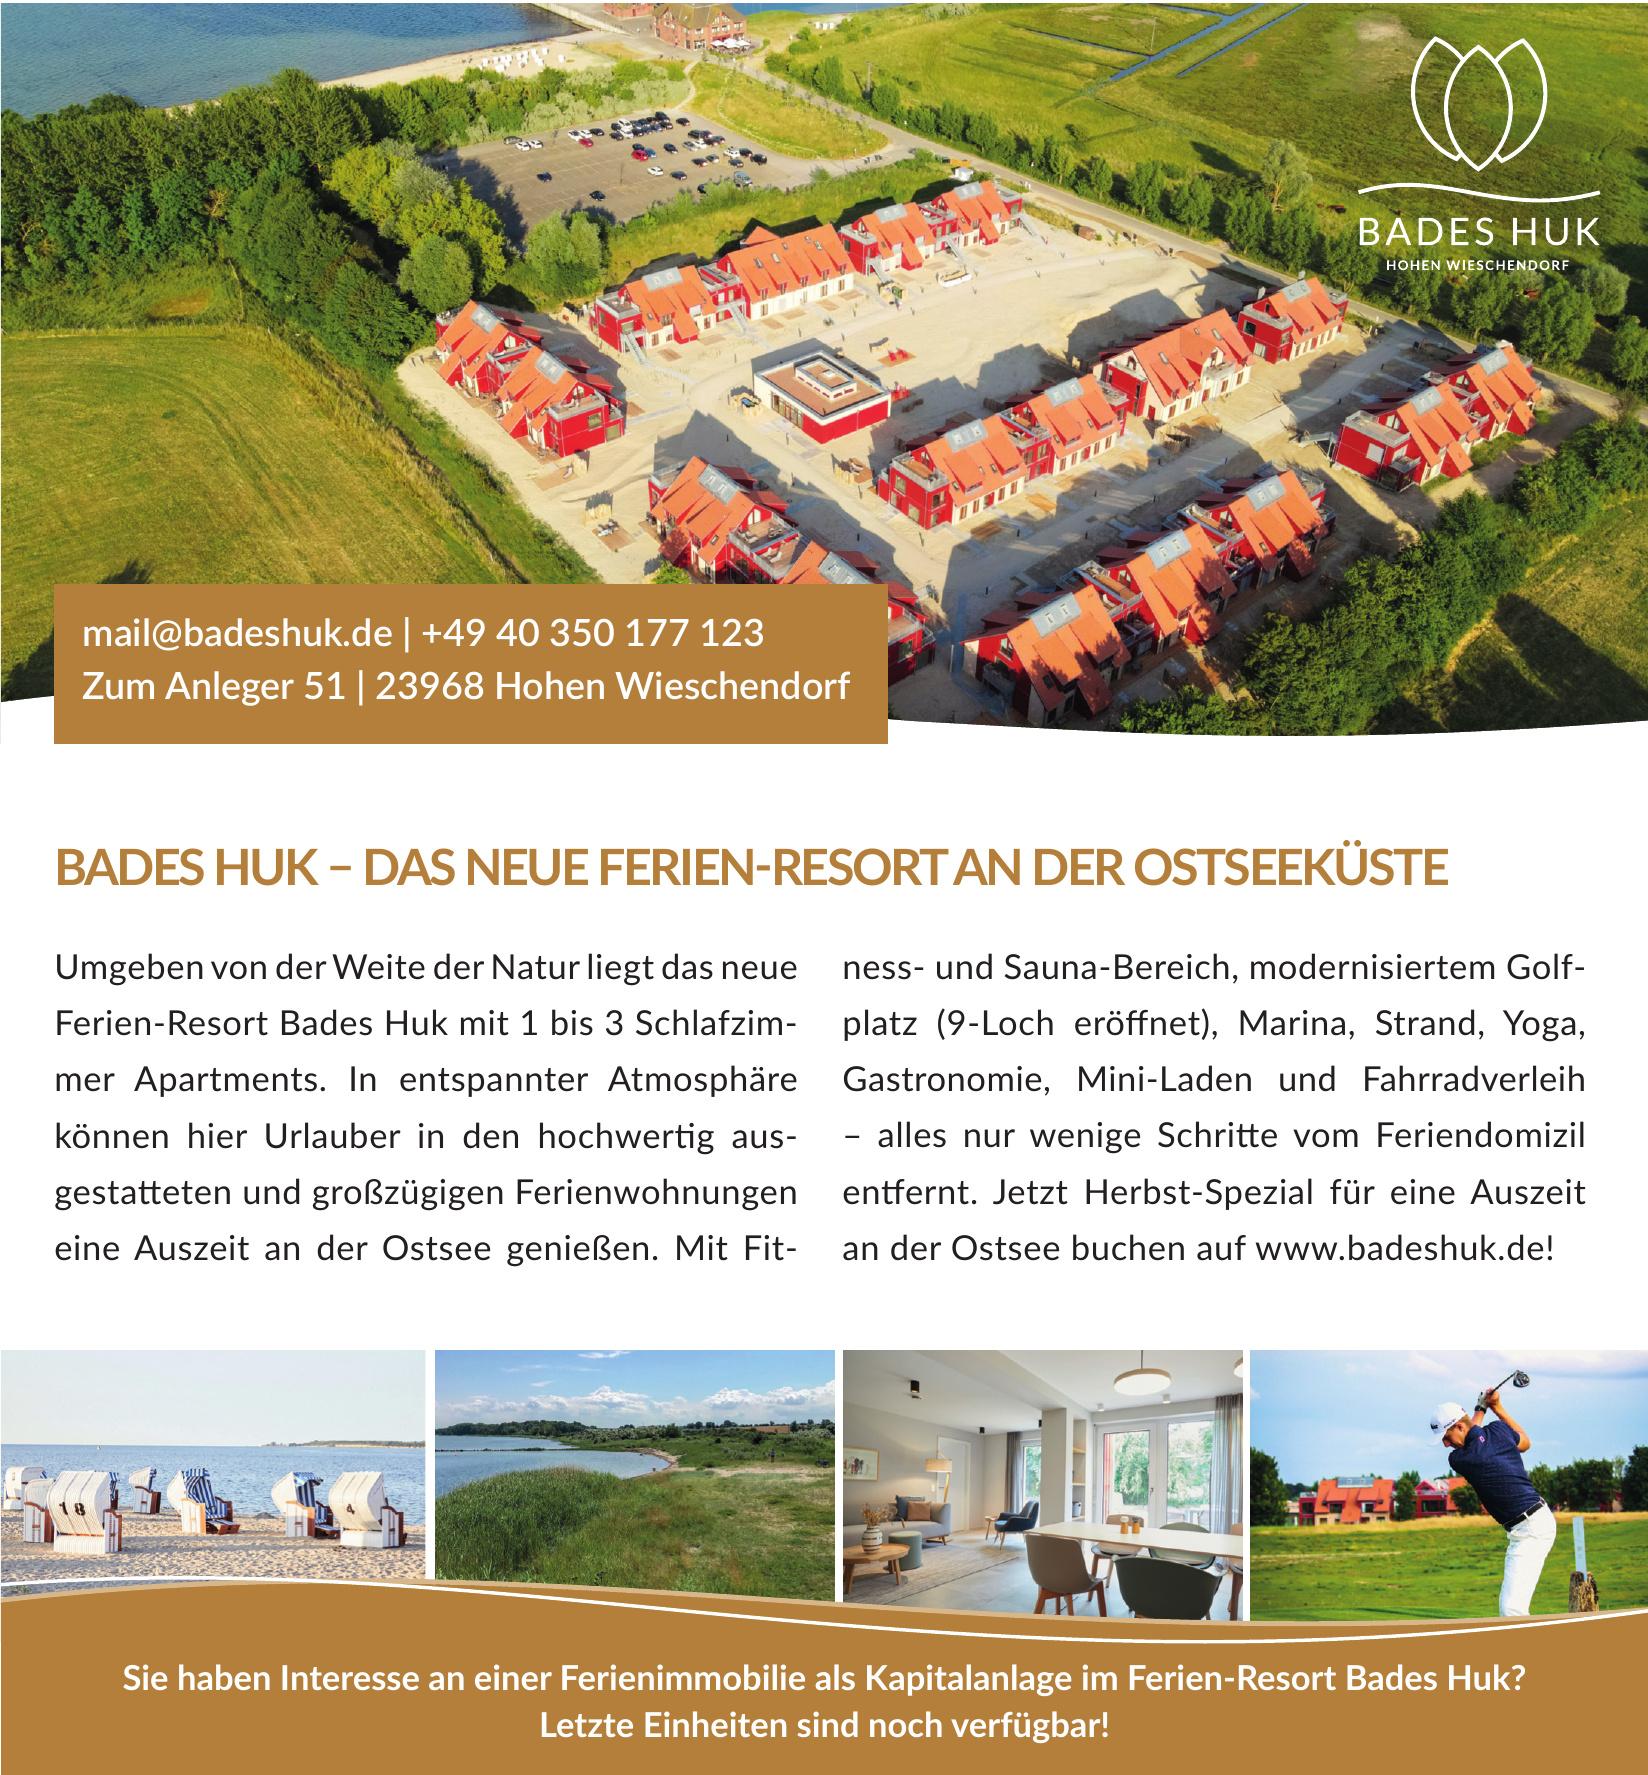 Ferien-Resort Bades Huk